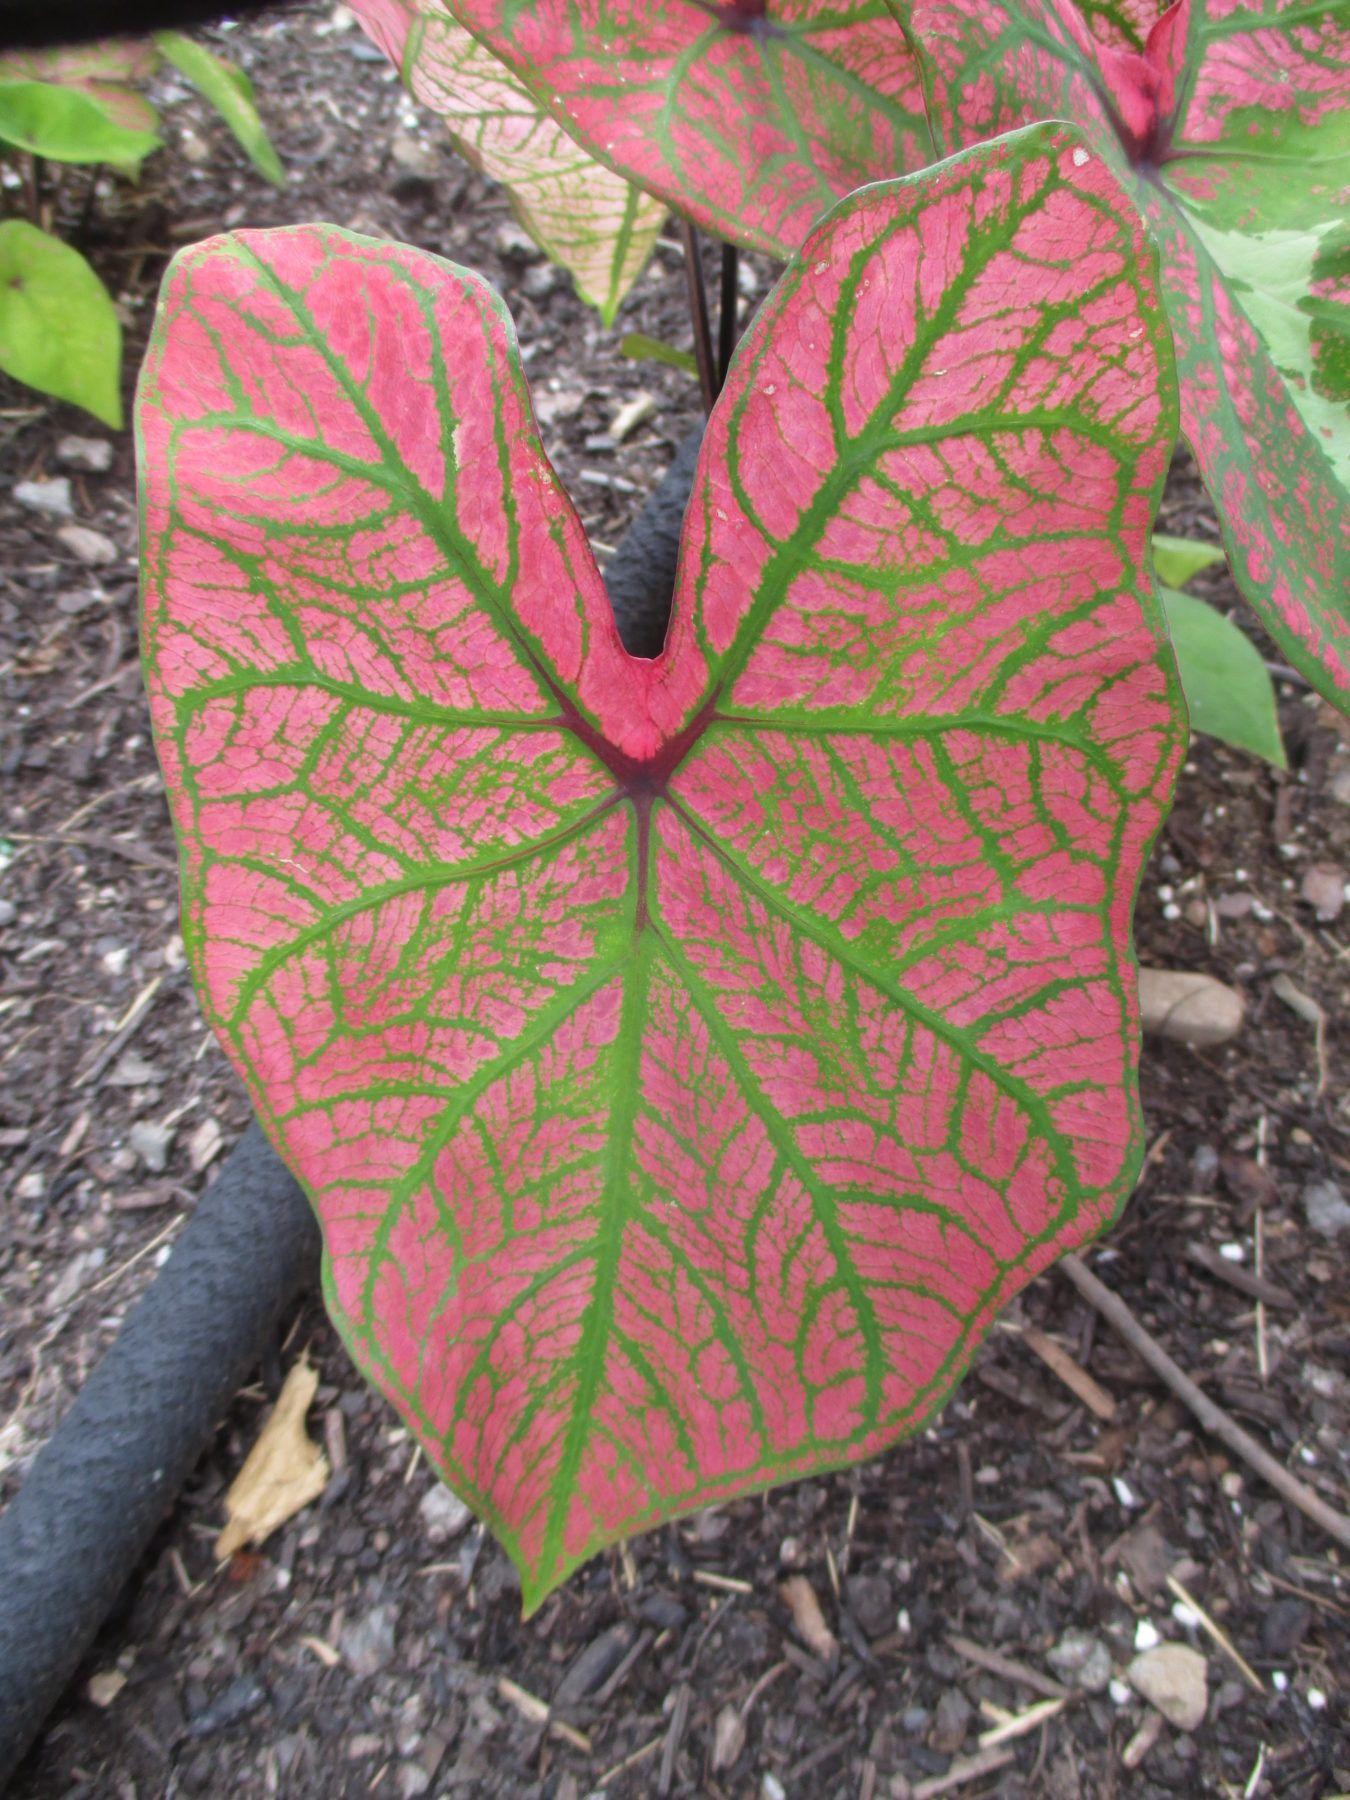 Spring Fling Caladium Bulbs Elephant Ear Perennial Leaf Flower Tropical Bonsai